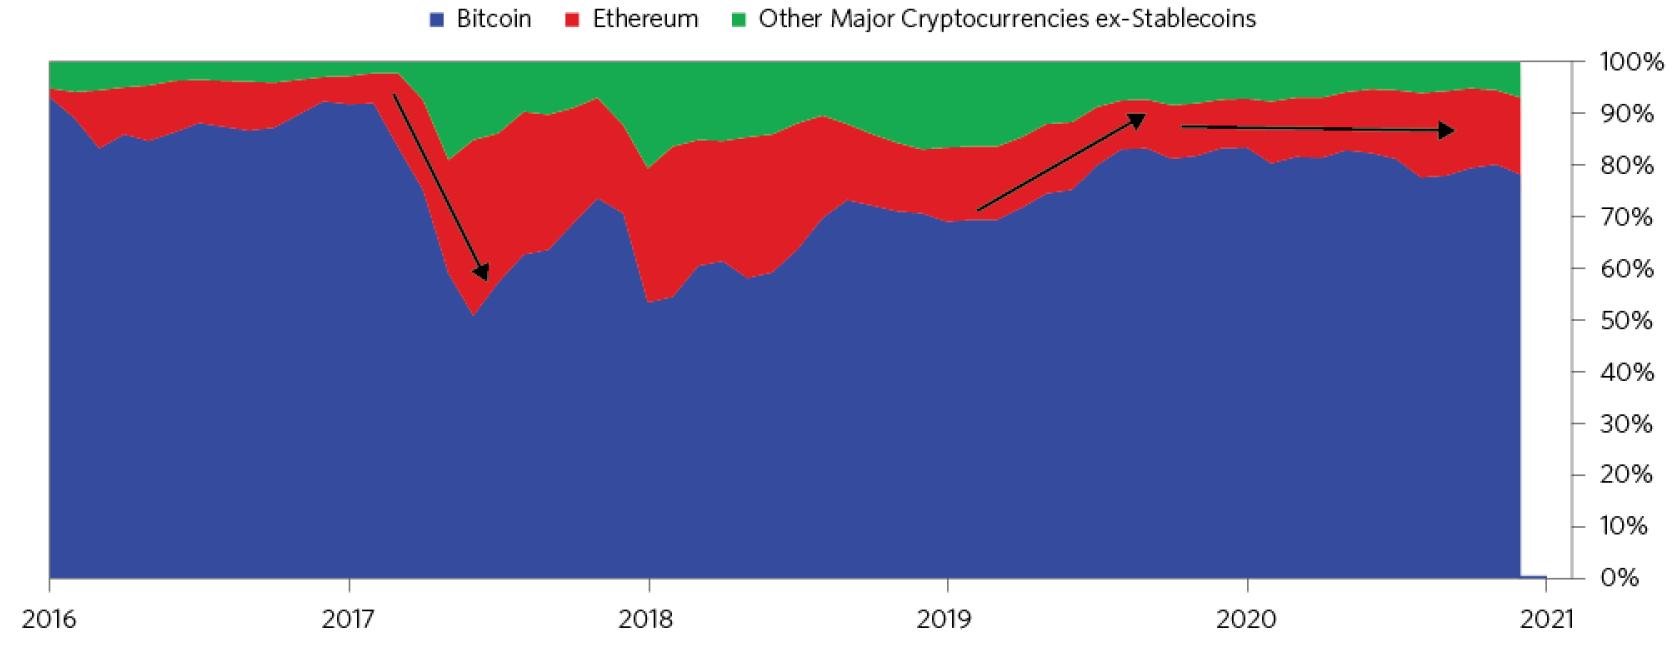 brokeri interactivi futures scurt bitcoin schimbul de criptocurrency online